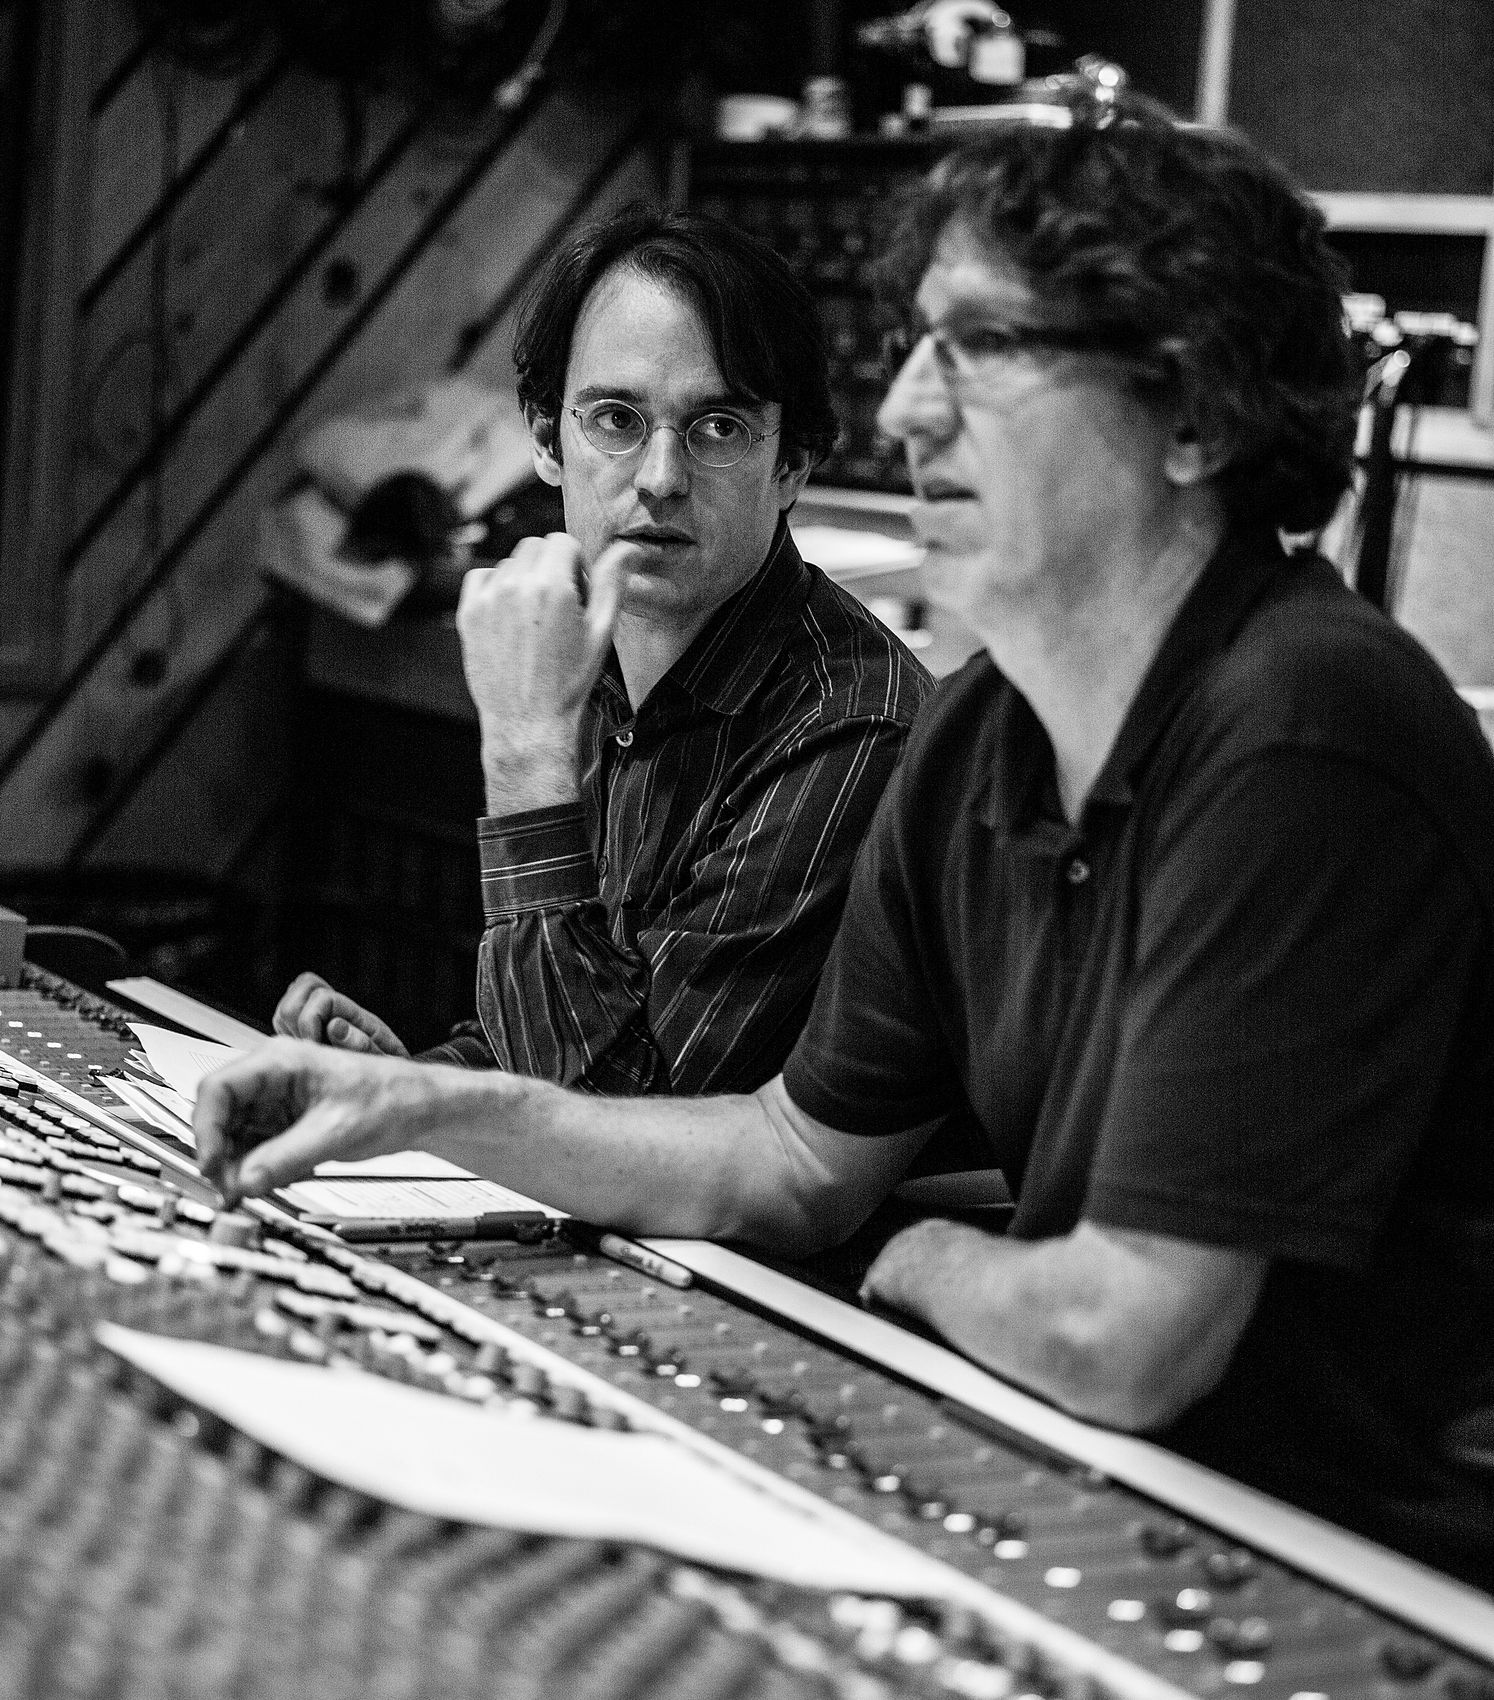 Patrick Zimmerli, Dave O'Donnell, Avatar Studios NYC 2013